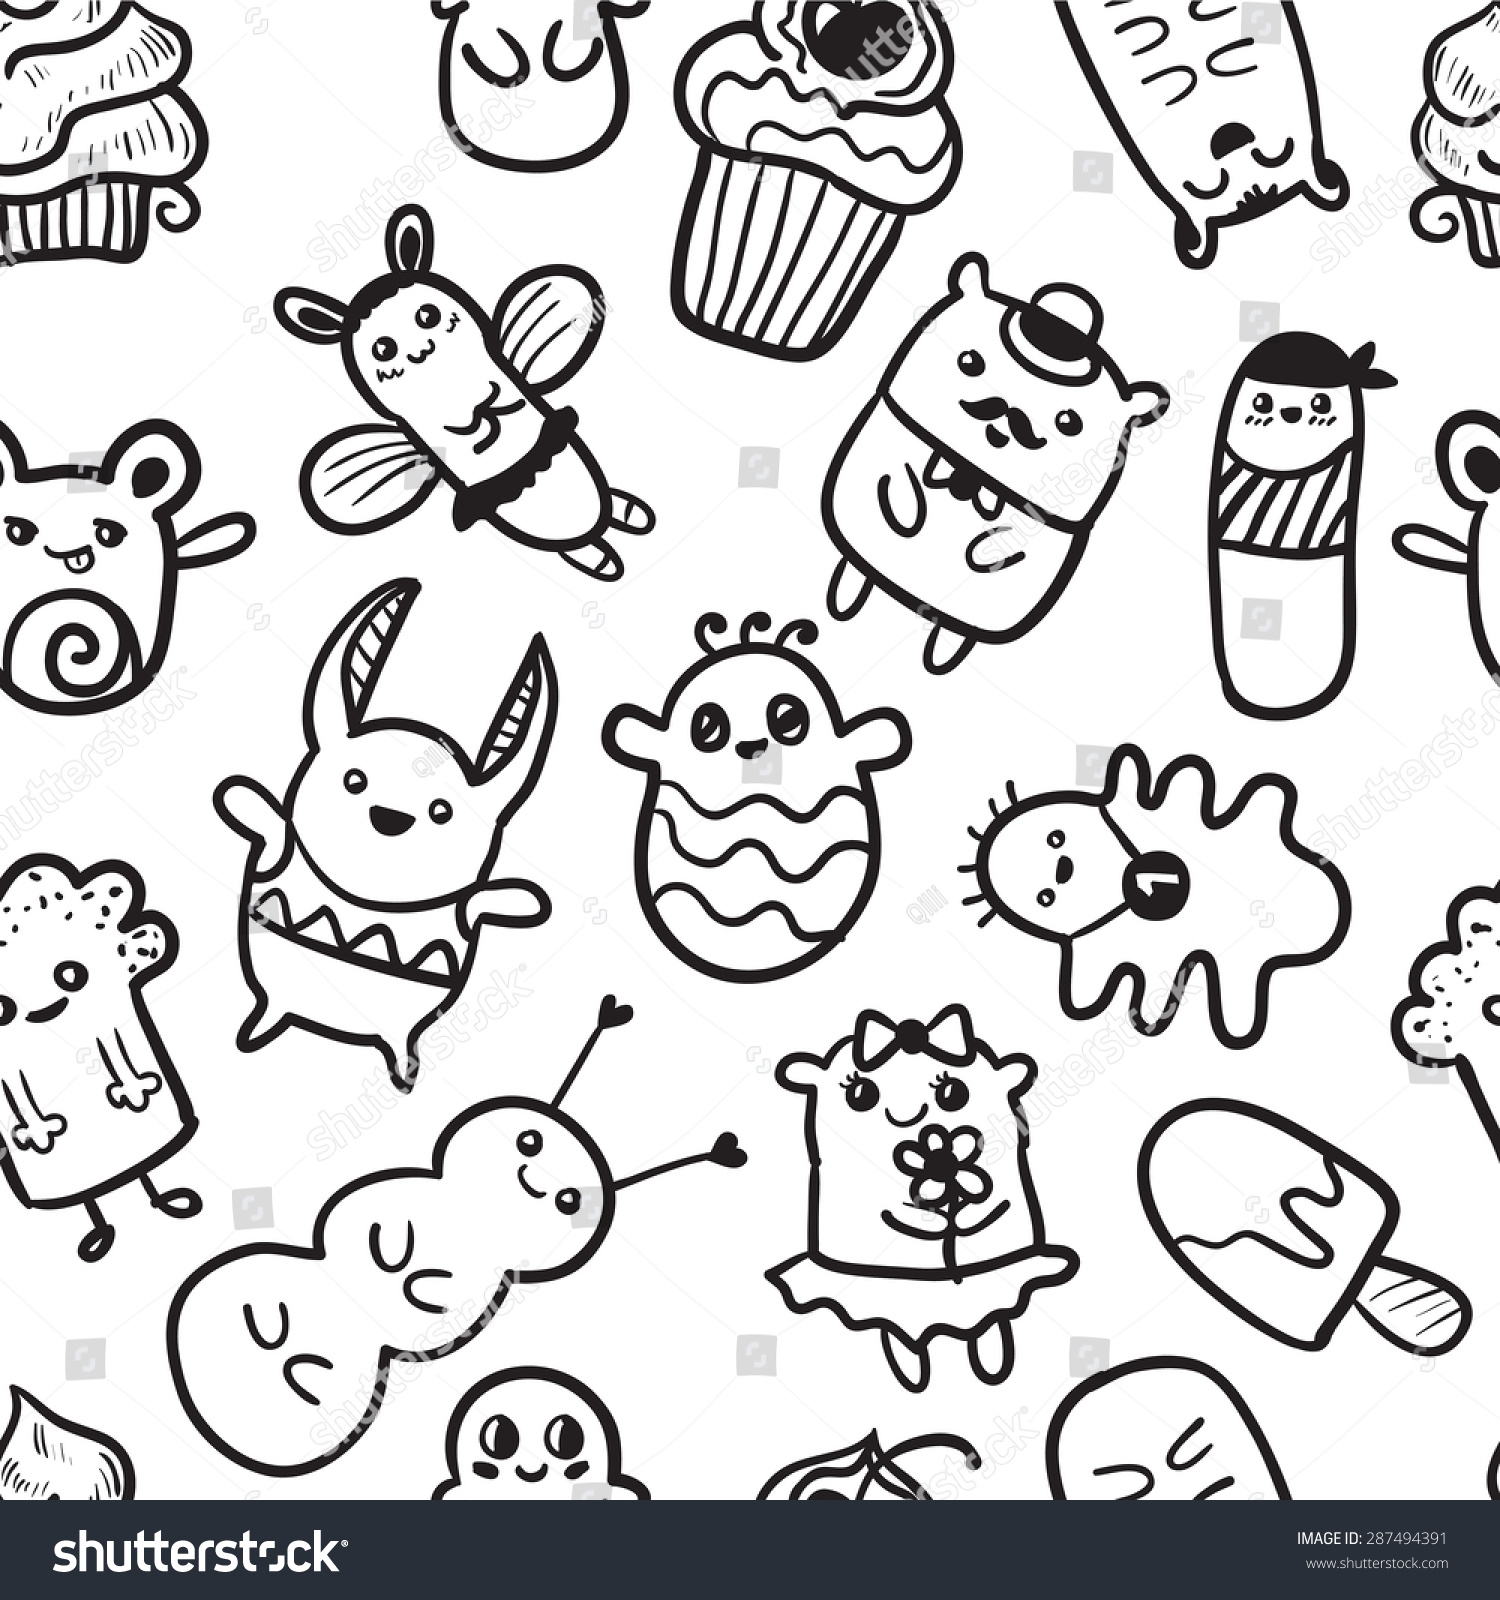 1500x1600 Graffiti Doodle Monster Doodle Monster Graffiti Guerilla Street